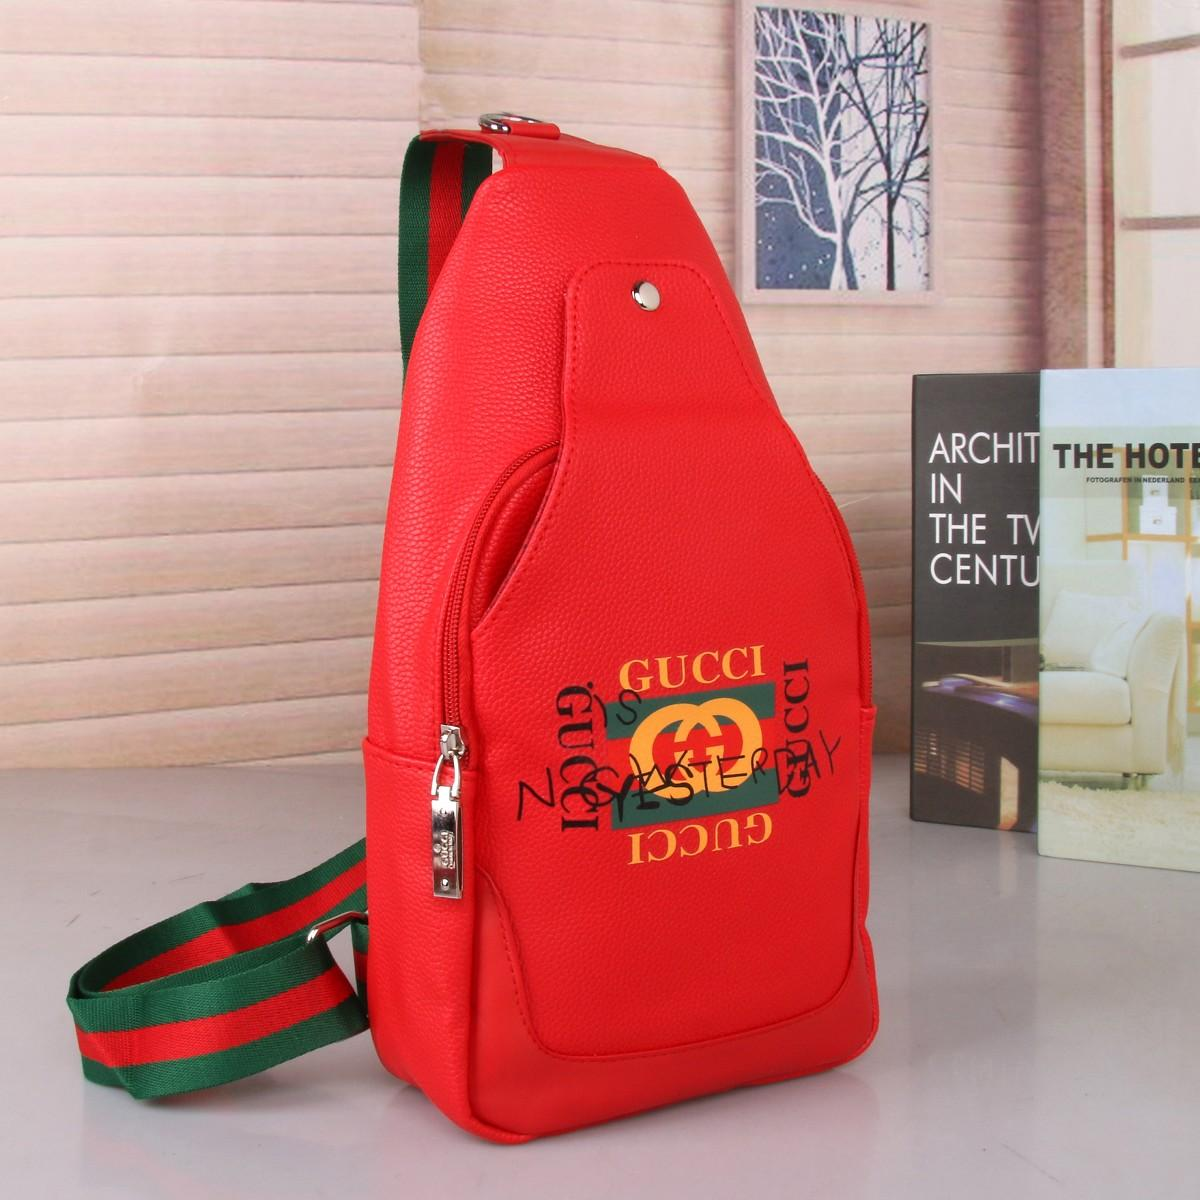 fd38e737281 Women Shoulder Bags Women Luxury Brand Chain Crossbody Bag Fashion Quilted  Heart Leather Handbags Female Famous Designer Purse Bag 2019 Shoulder Bags  ...